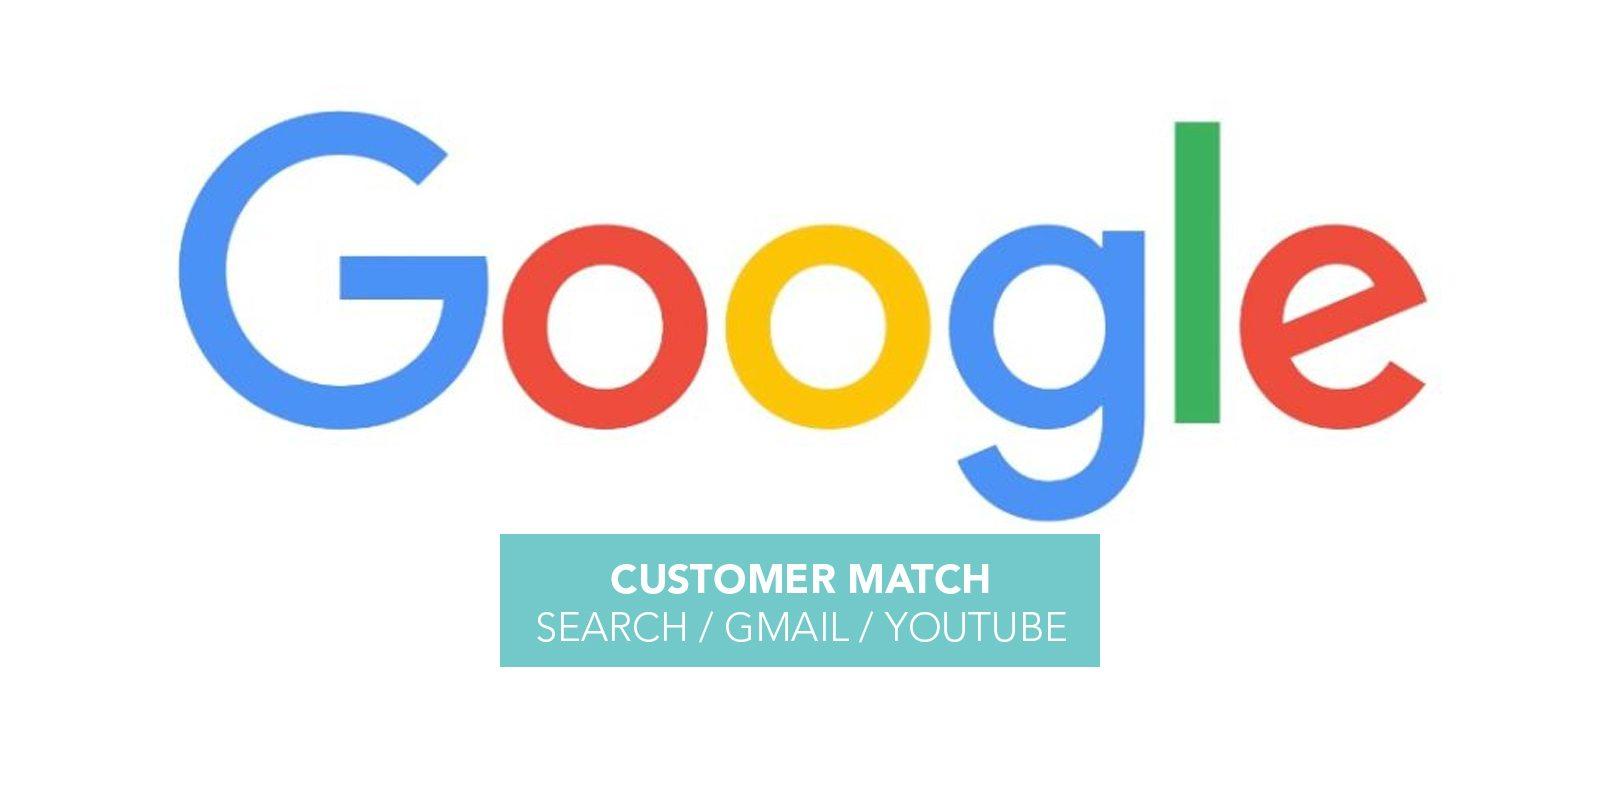 Adwords Customer Match